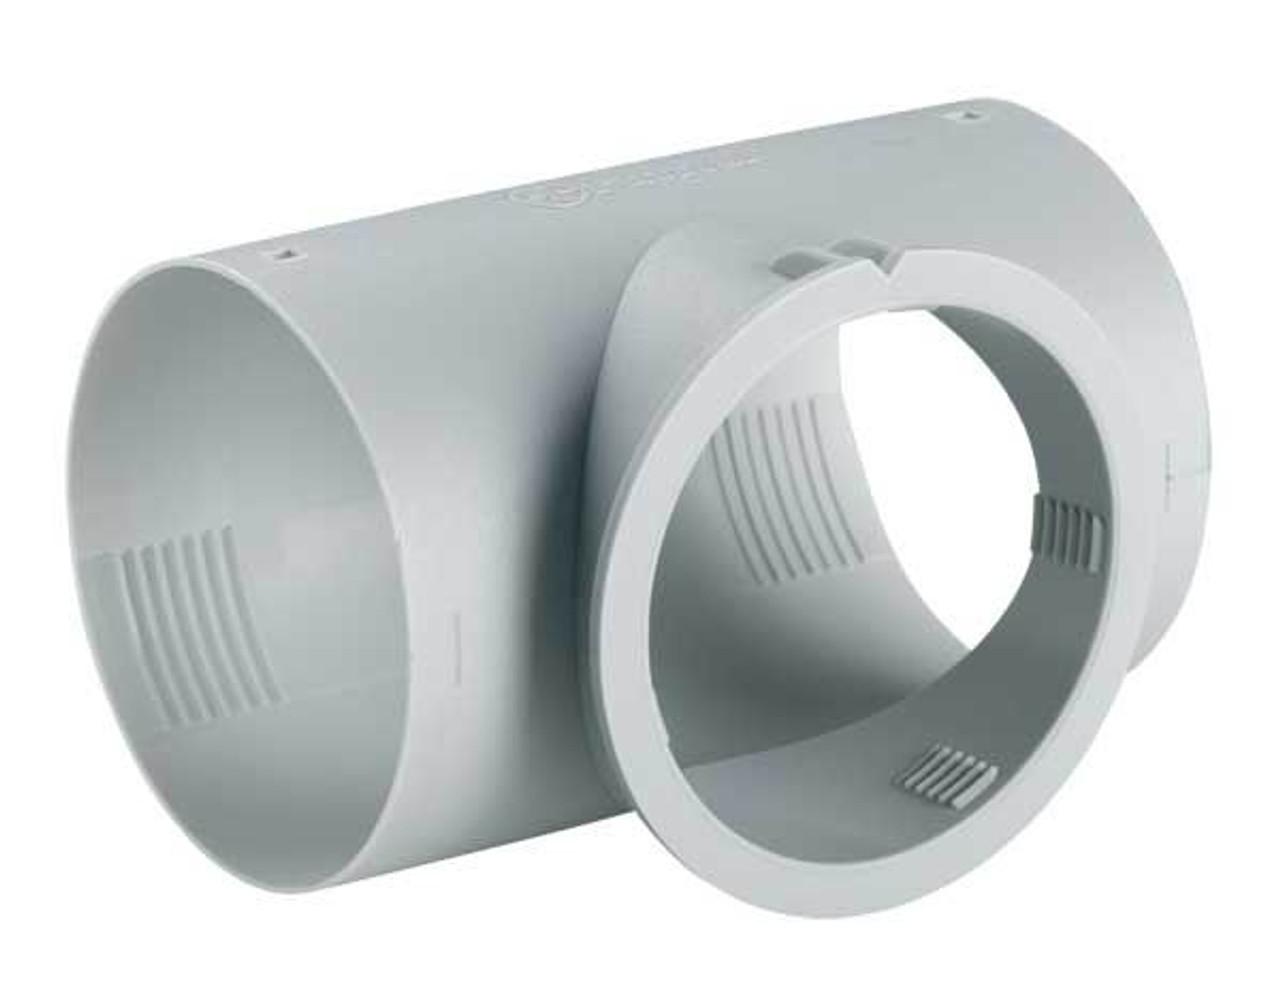 Truma T-Pipe LT Ducting Fitting (40151-52)